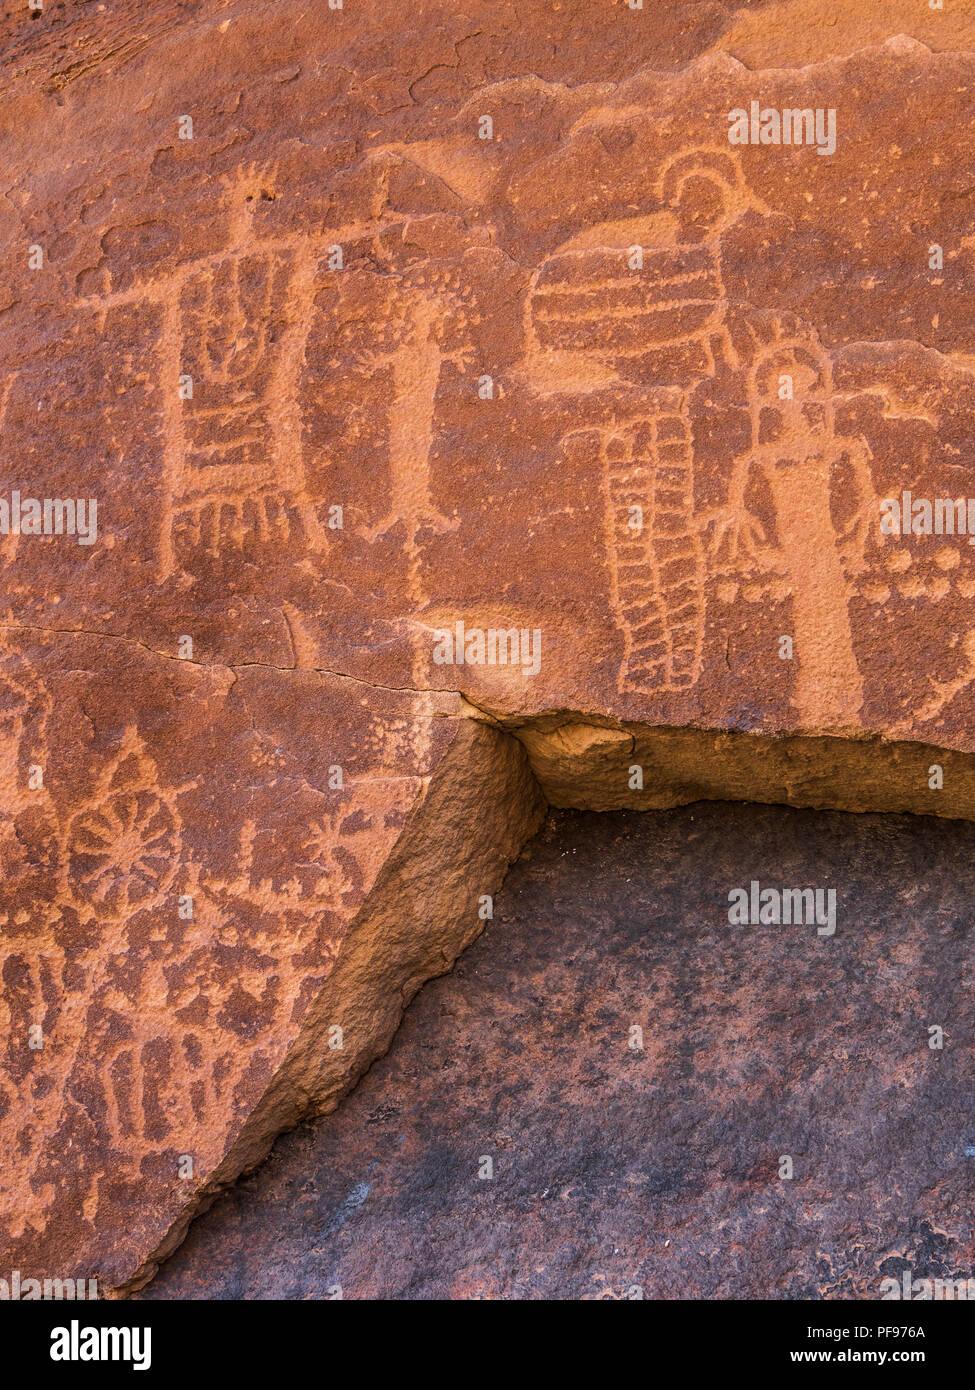 Fremont Indian petroglyphs, Flat Canyon, upper Desolation Canyon north of Green River, Utah. - Stock Image